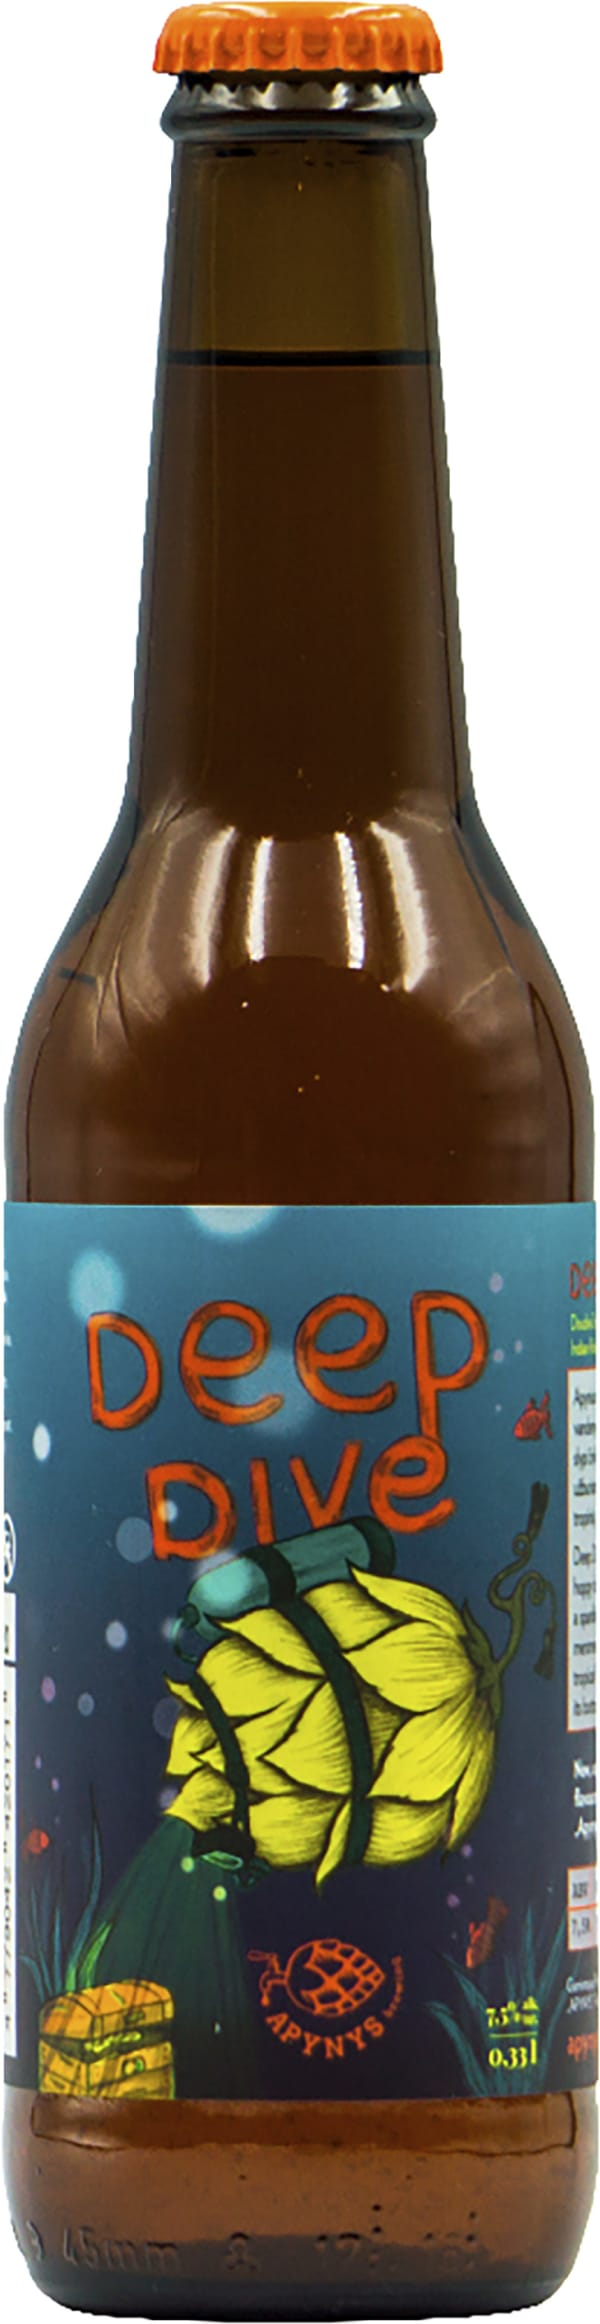 Apynys Deep Dive DDH DIPA